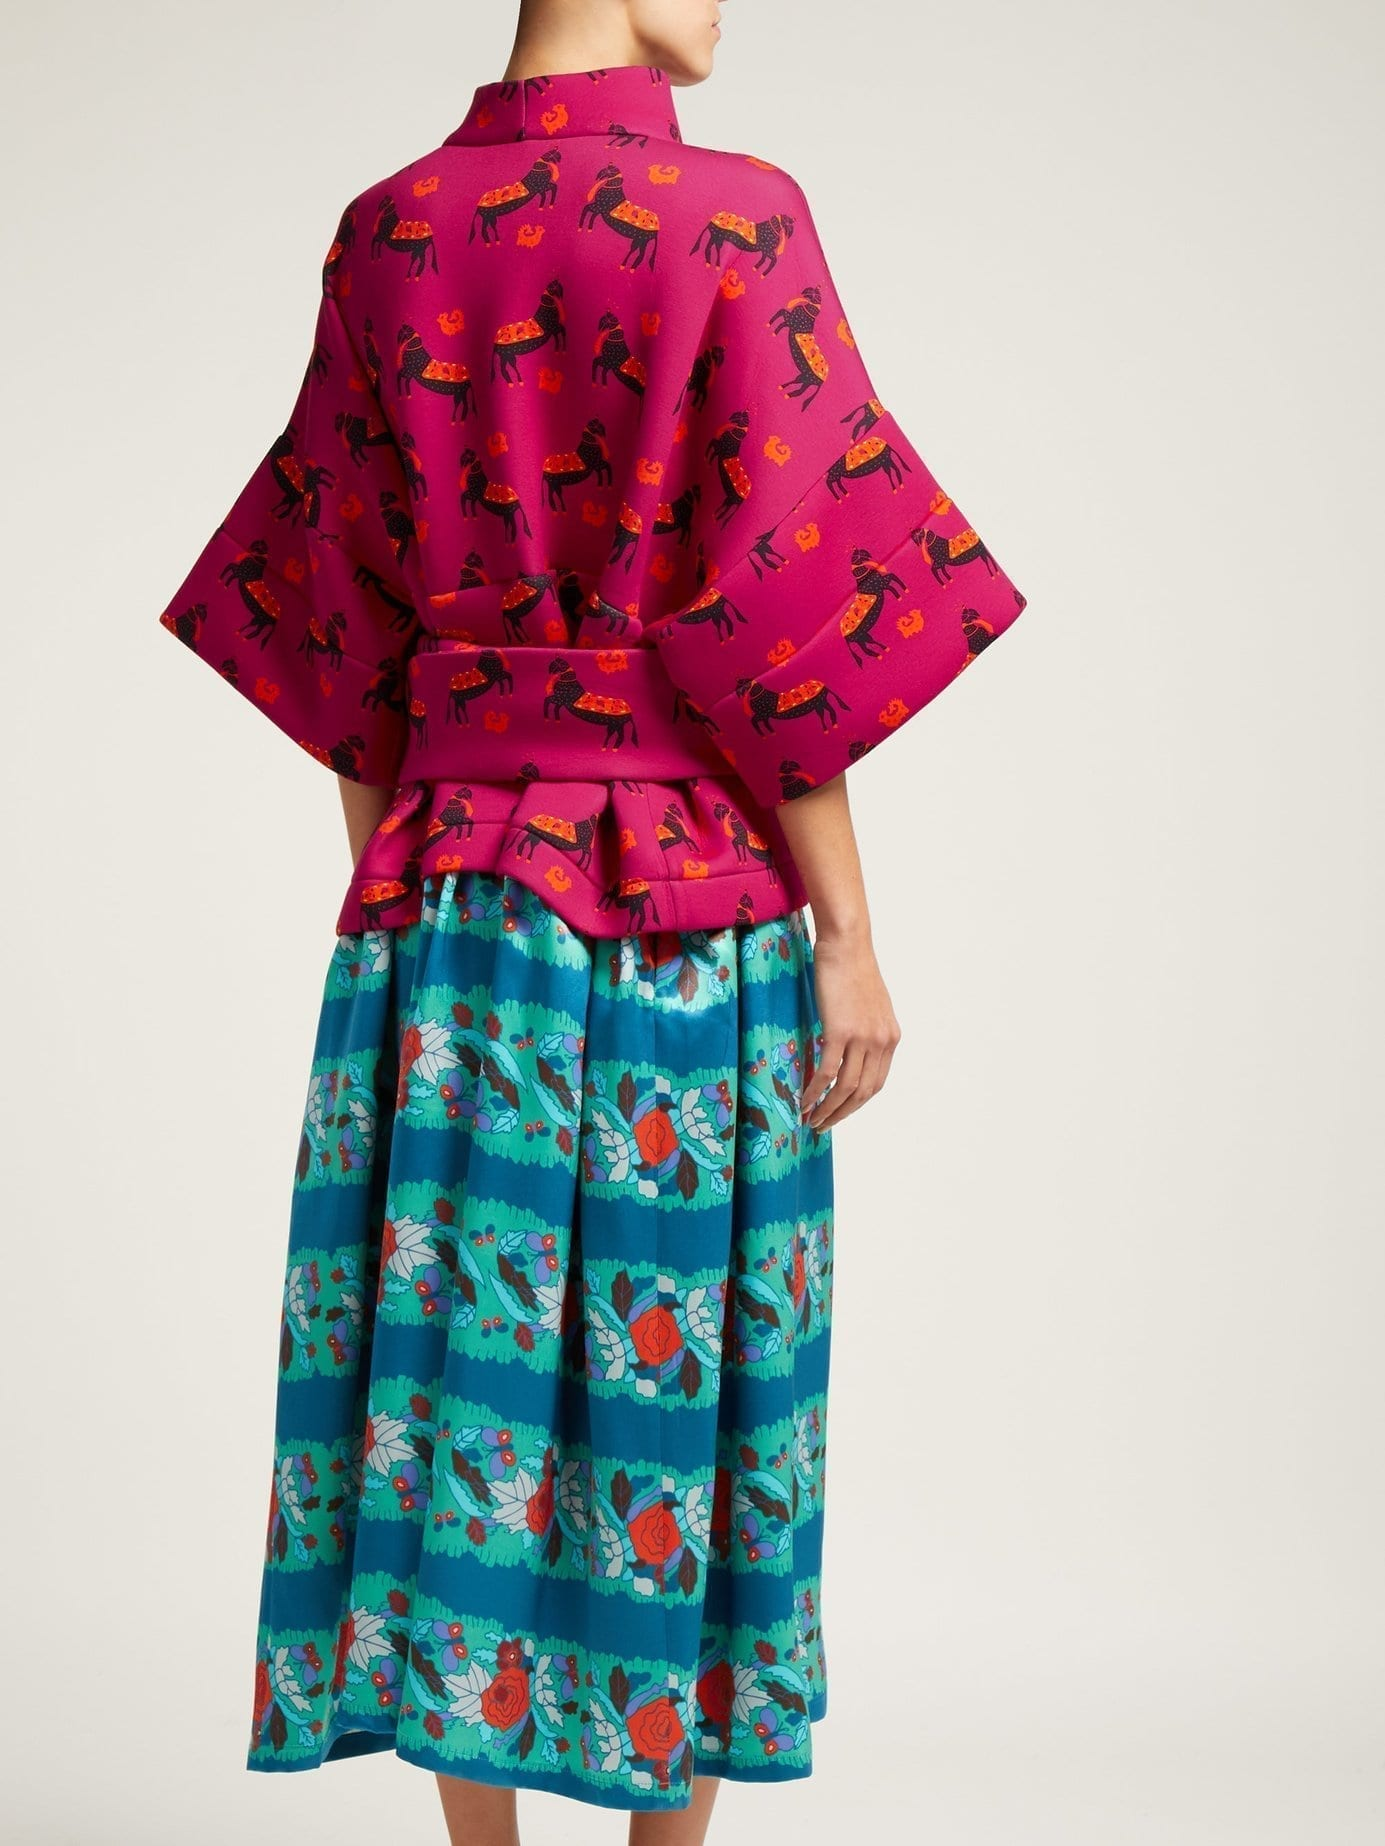 f835ac20a481 RIANNA + NINA Helena Neoprene And Silk Pink   Blue Dress - We Select ...